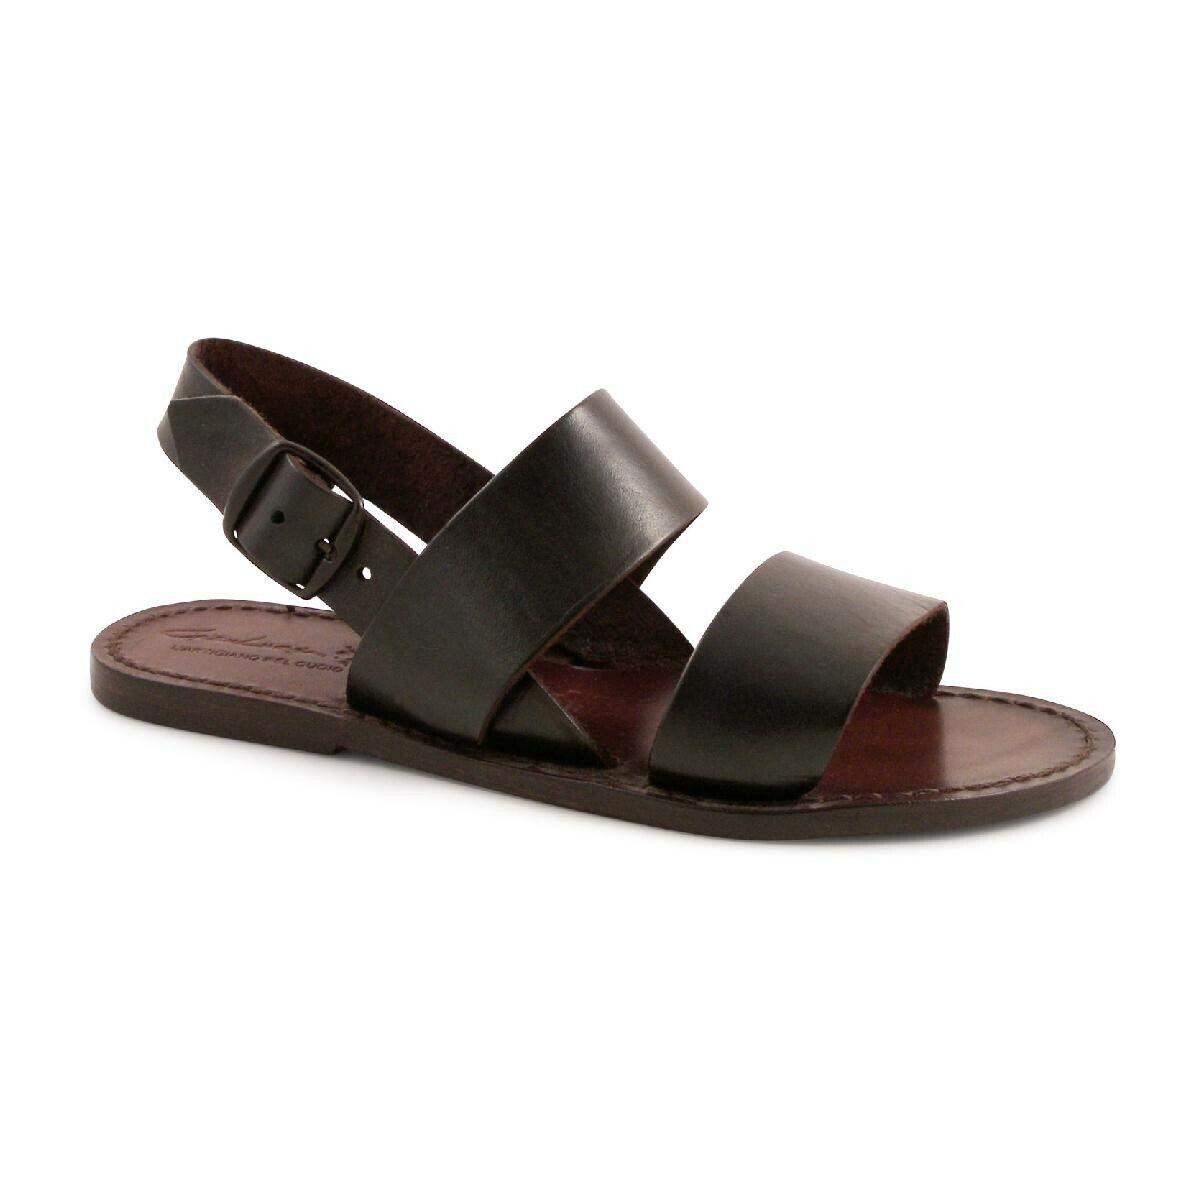 Hecho A Mano Para Mujer Zapatos Sandalias franciscano marrón oscuro cuero verdadero hecha en Italia